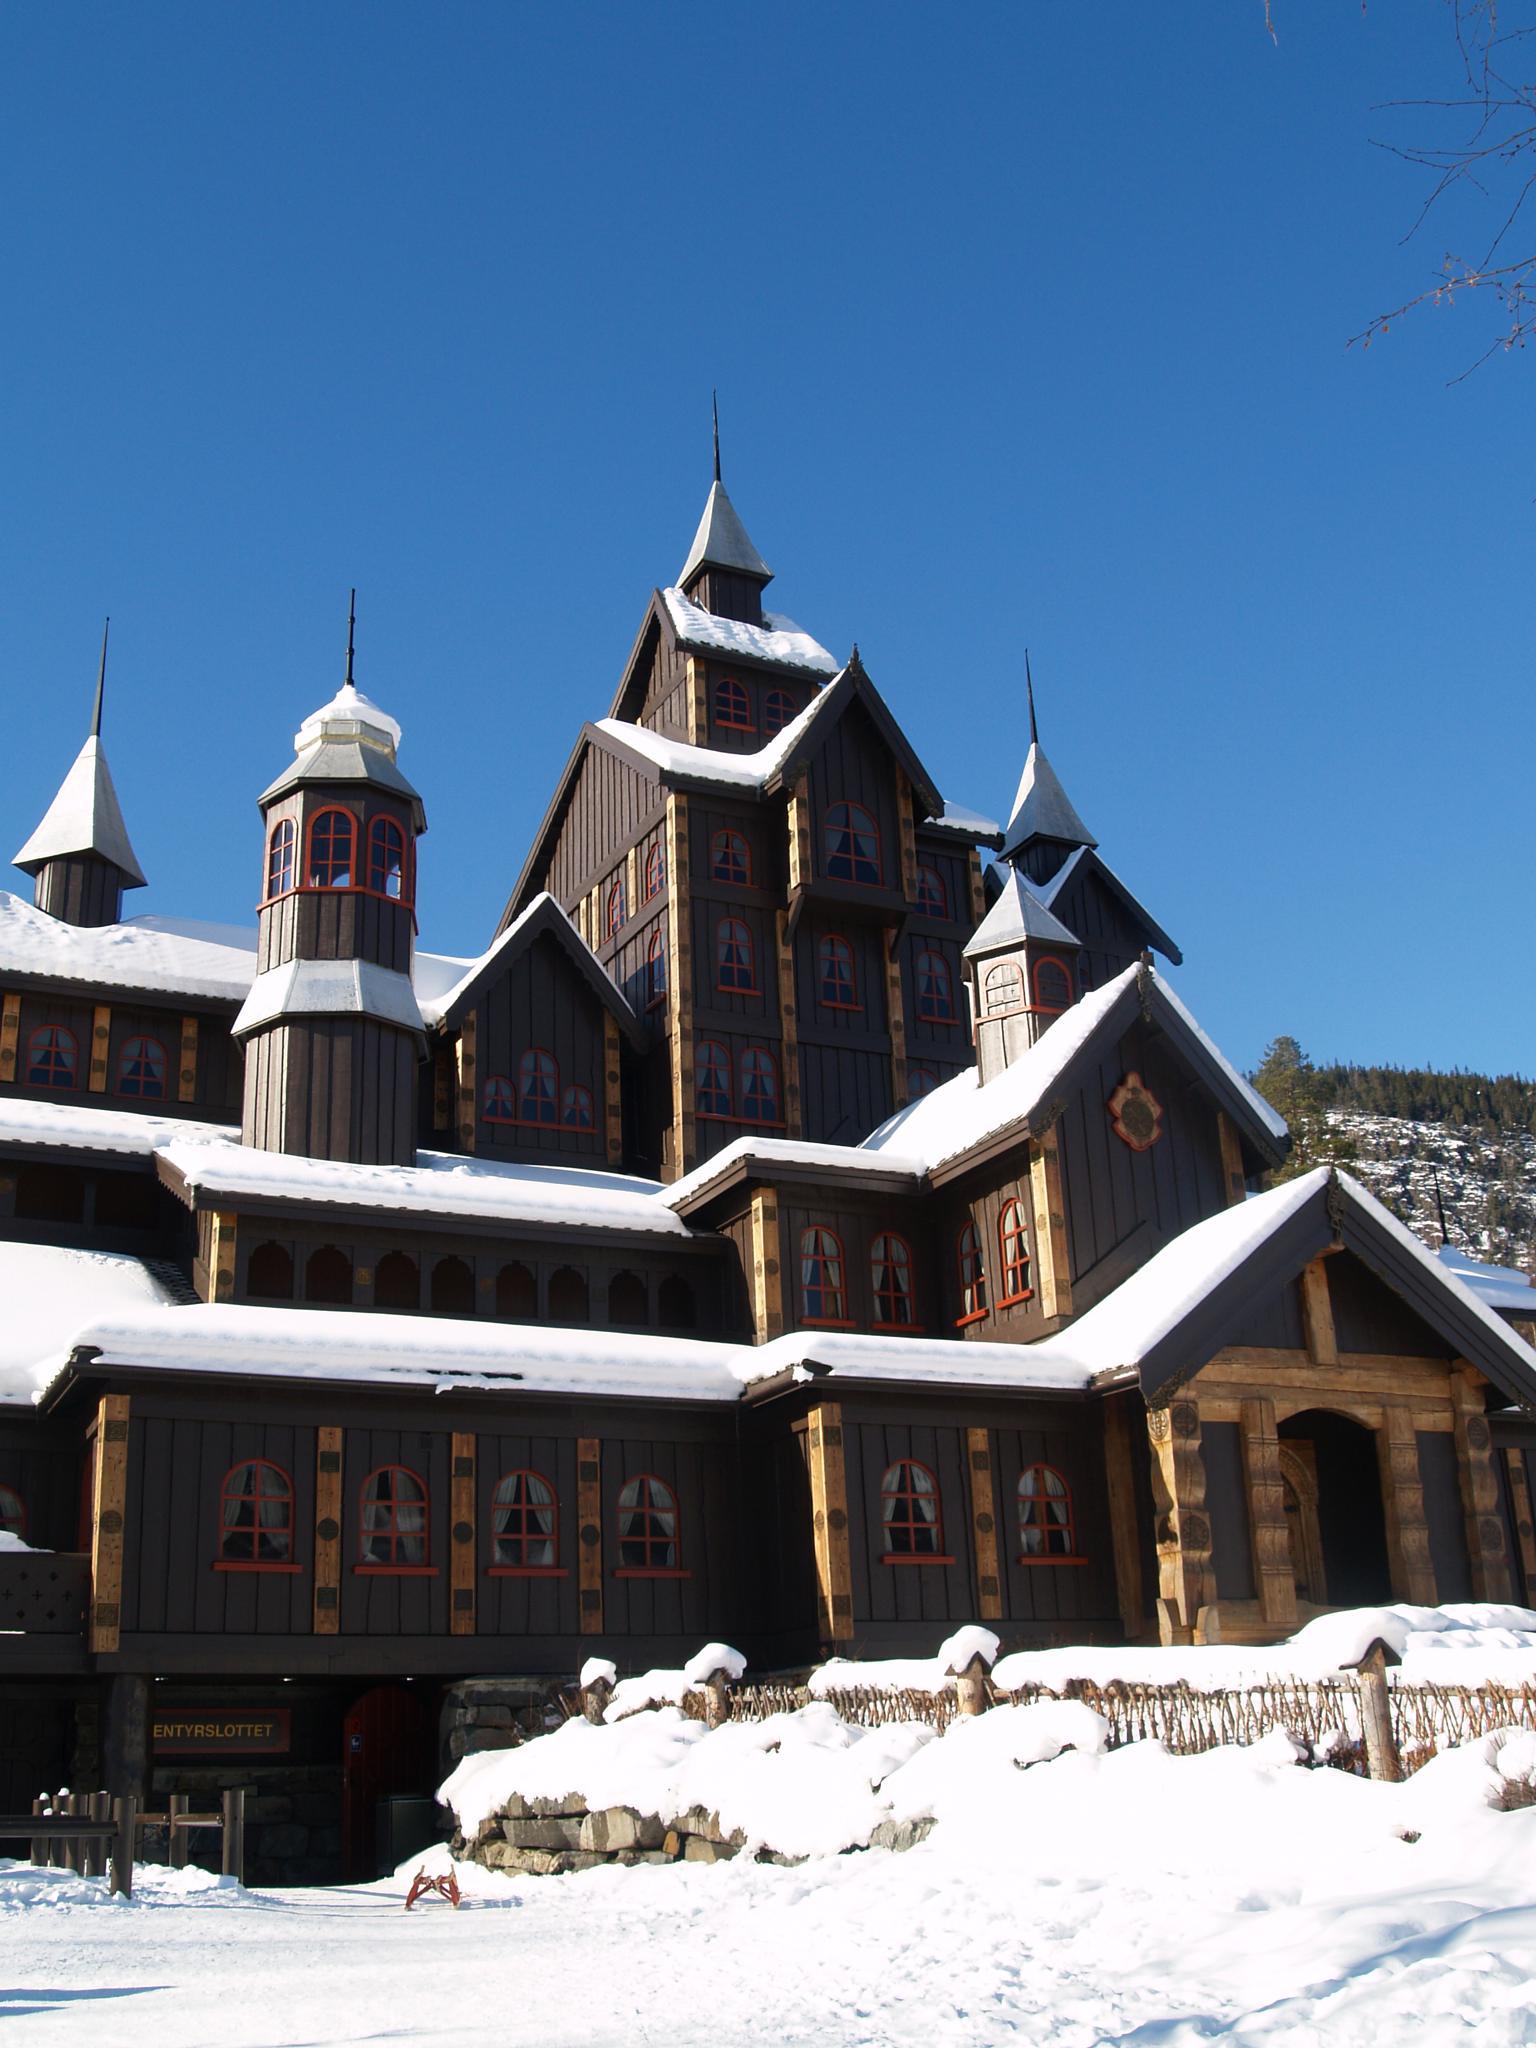 Eventyrslottet, The adventure palace by ester.ayerdi